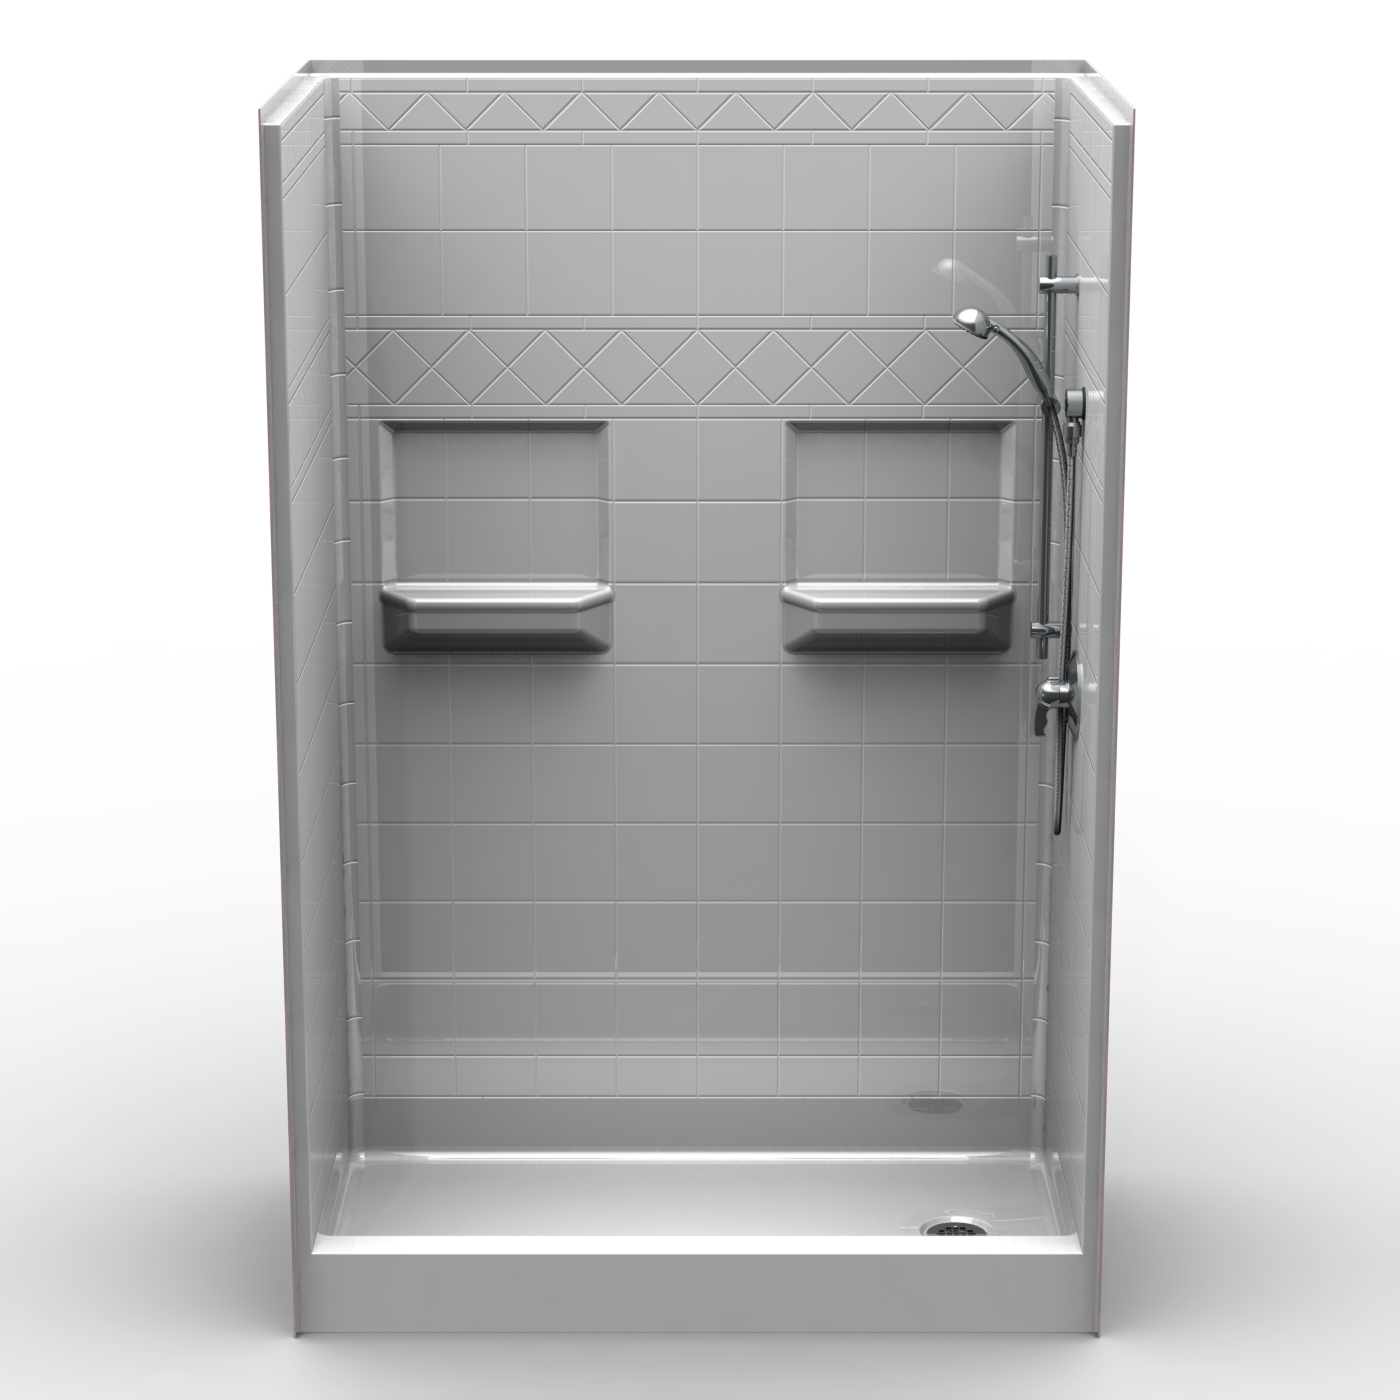 5 Piece Fibergl Shower Unit 54 X